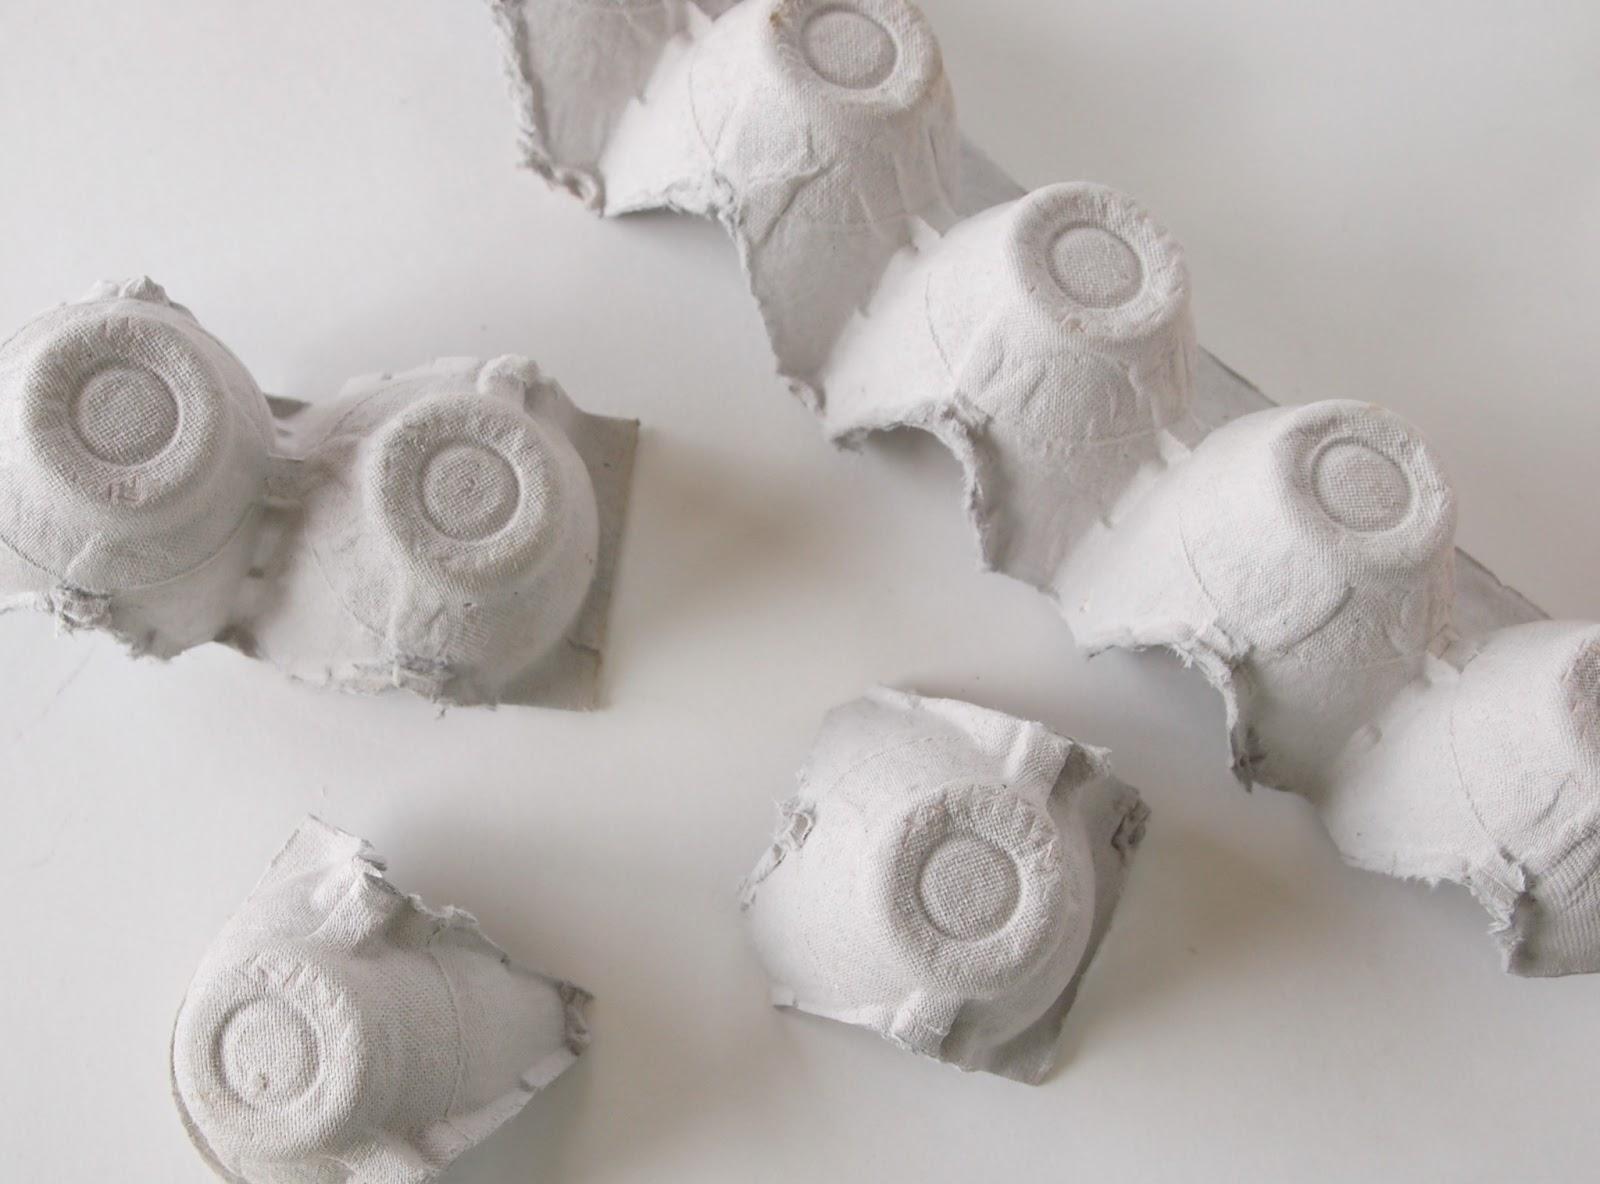 Egg carton bugs form ginger snap crafts a glimpse inside for Styrofoam egg carton crafts